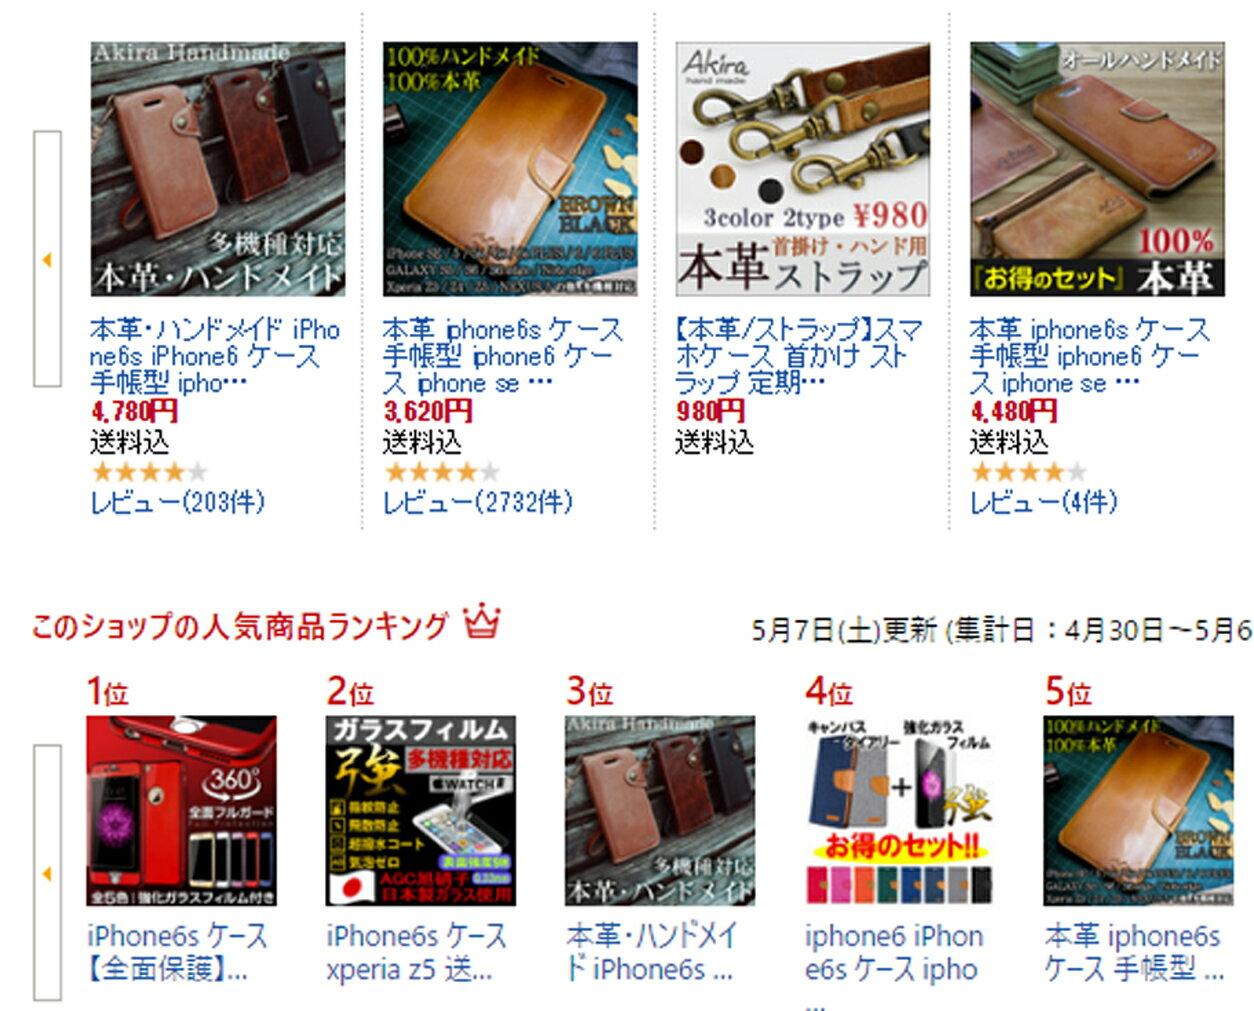 [SONY] Akira手工真皮皮套 [基本款棕色][Z2,Z3,Z4,Z5,Z5+,Z5C,C4] 8